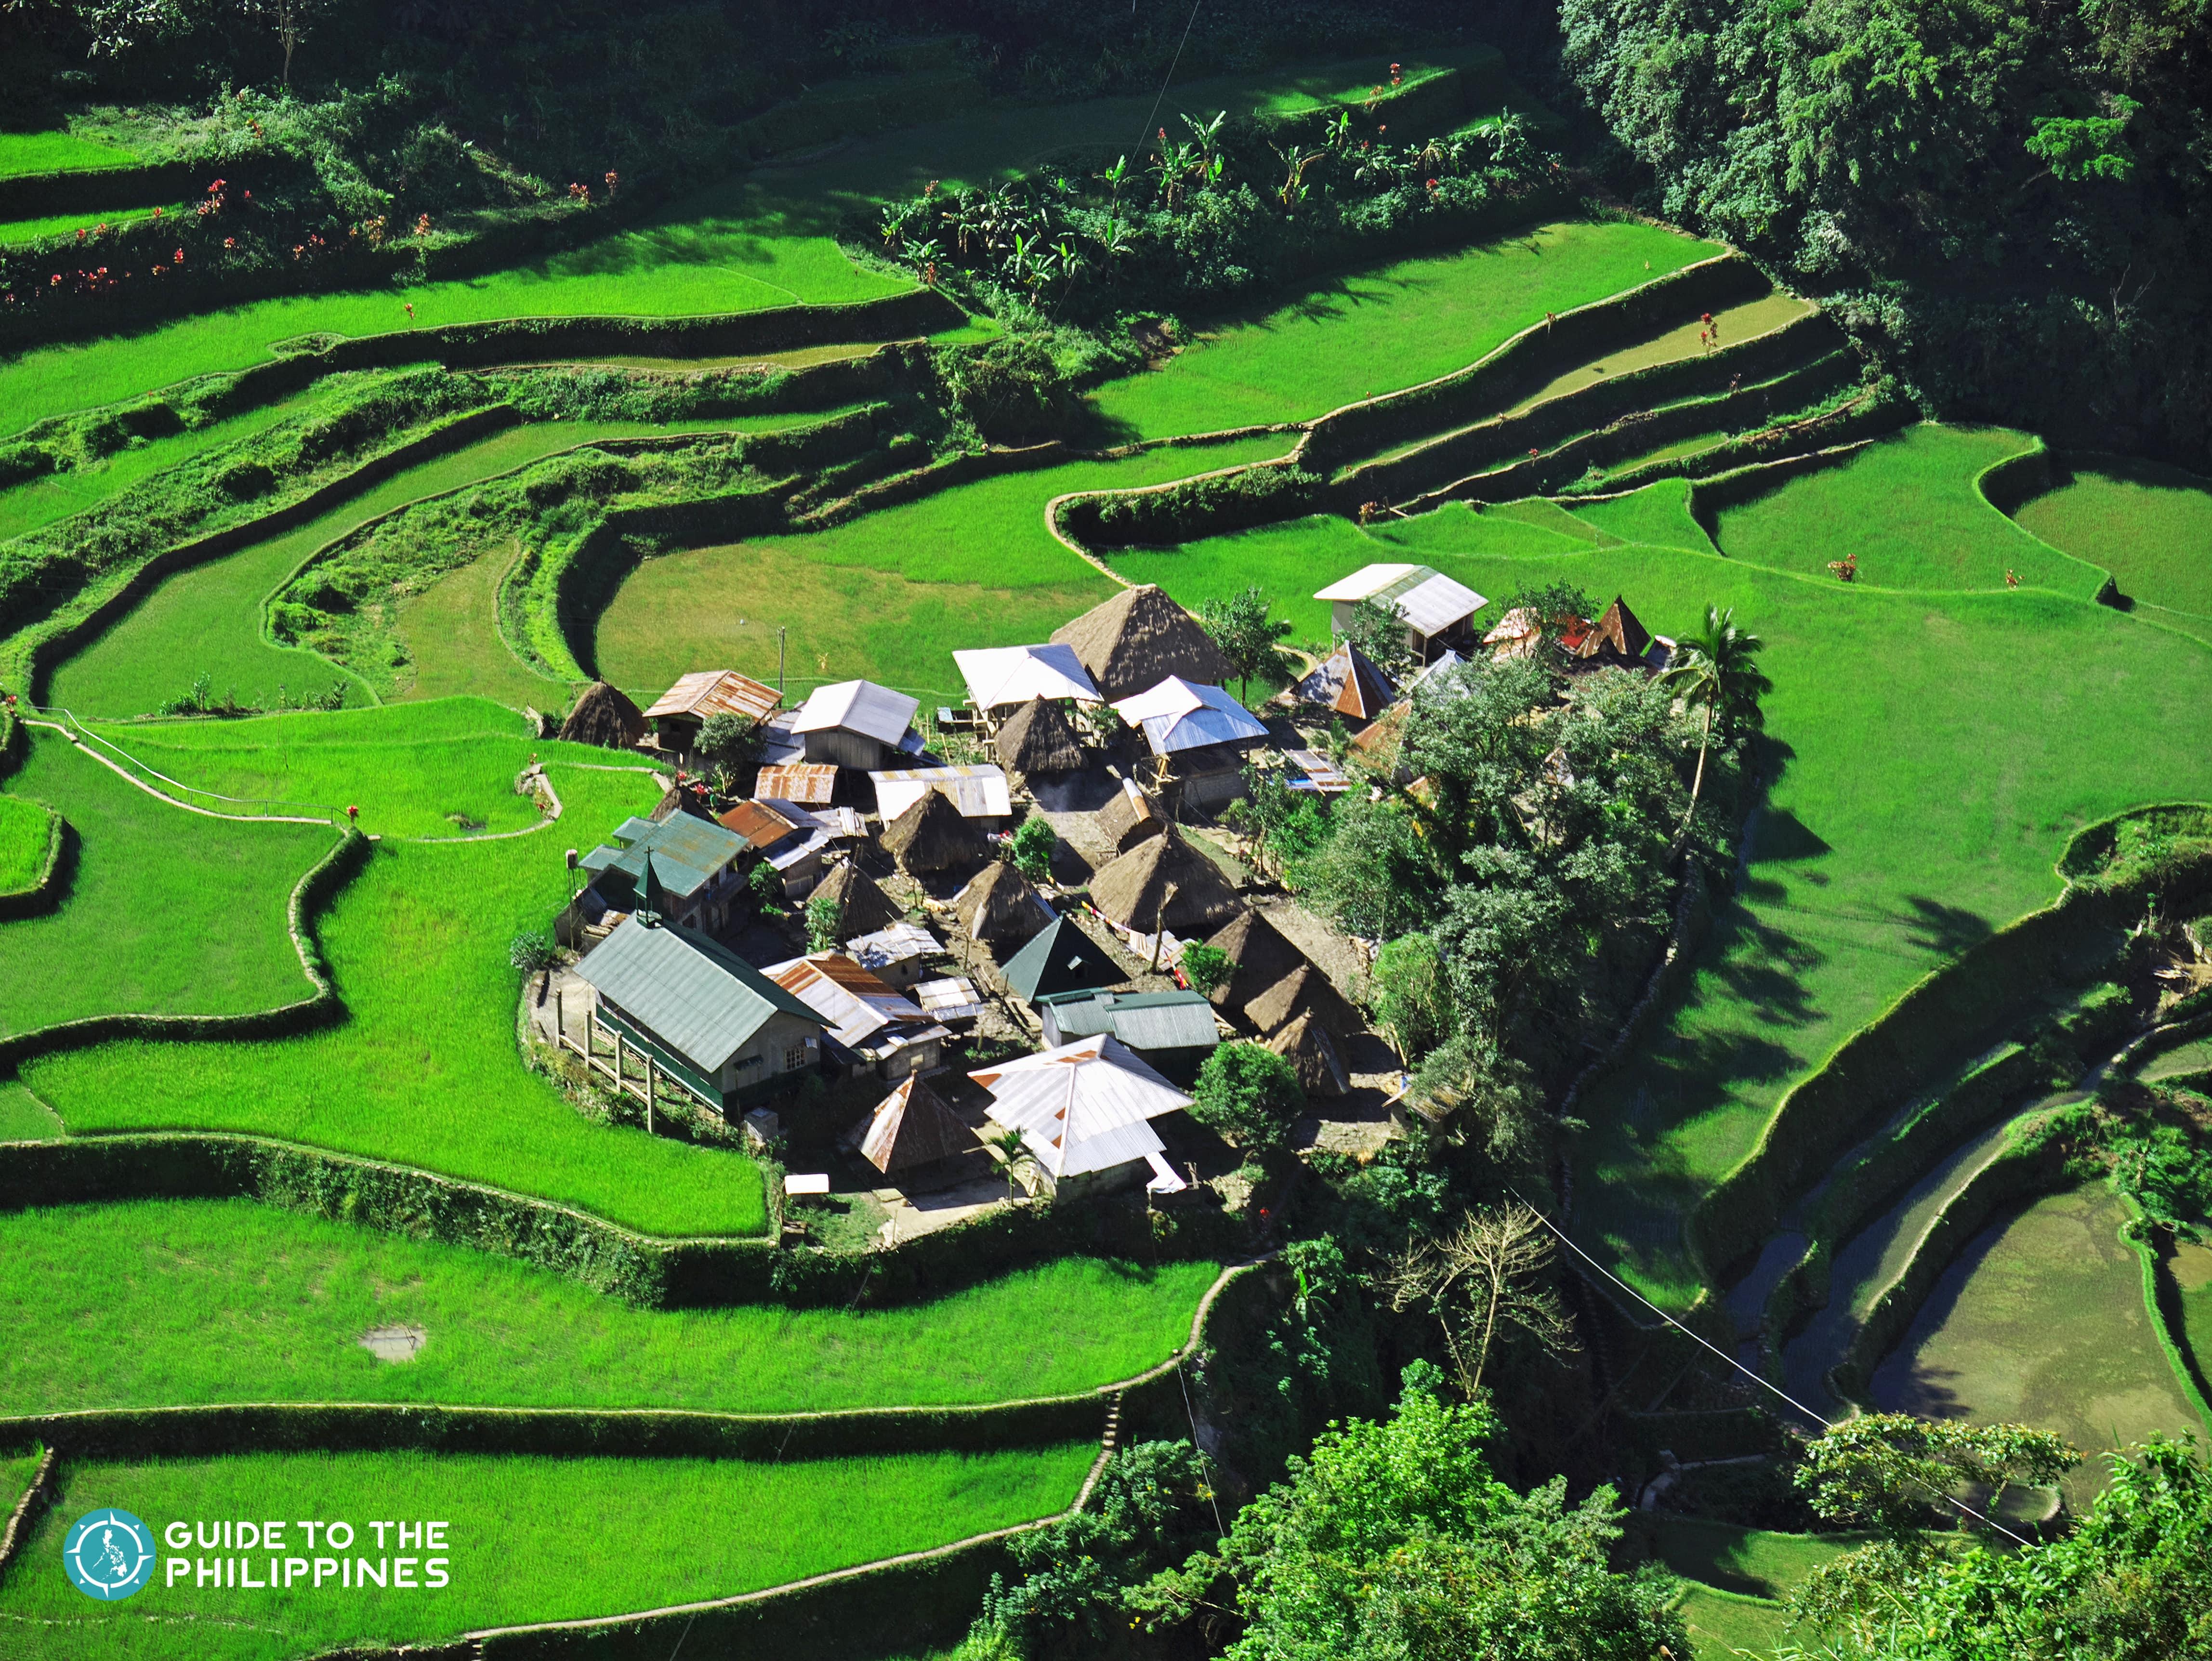 Aerial view of Bangaan Village in Banaue